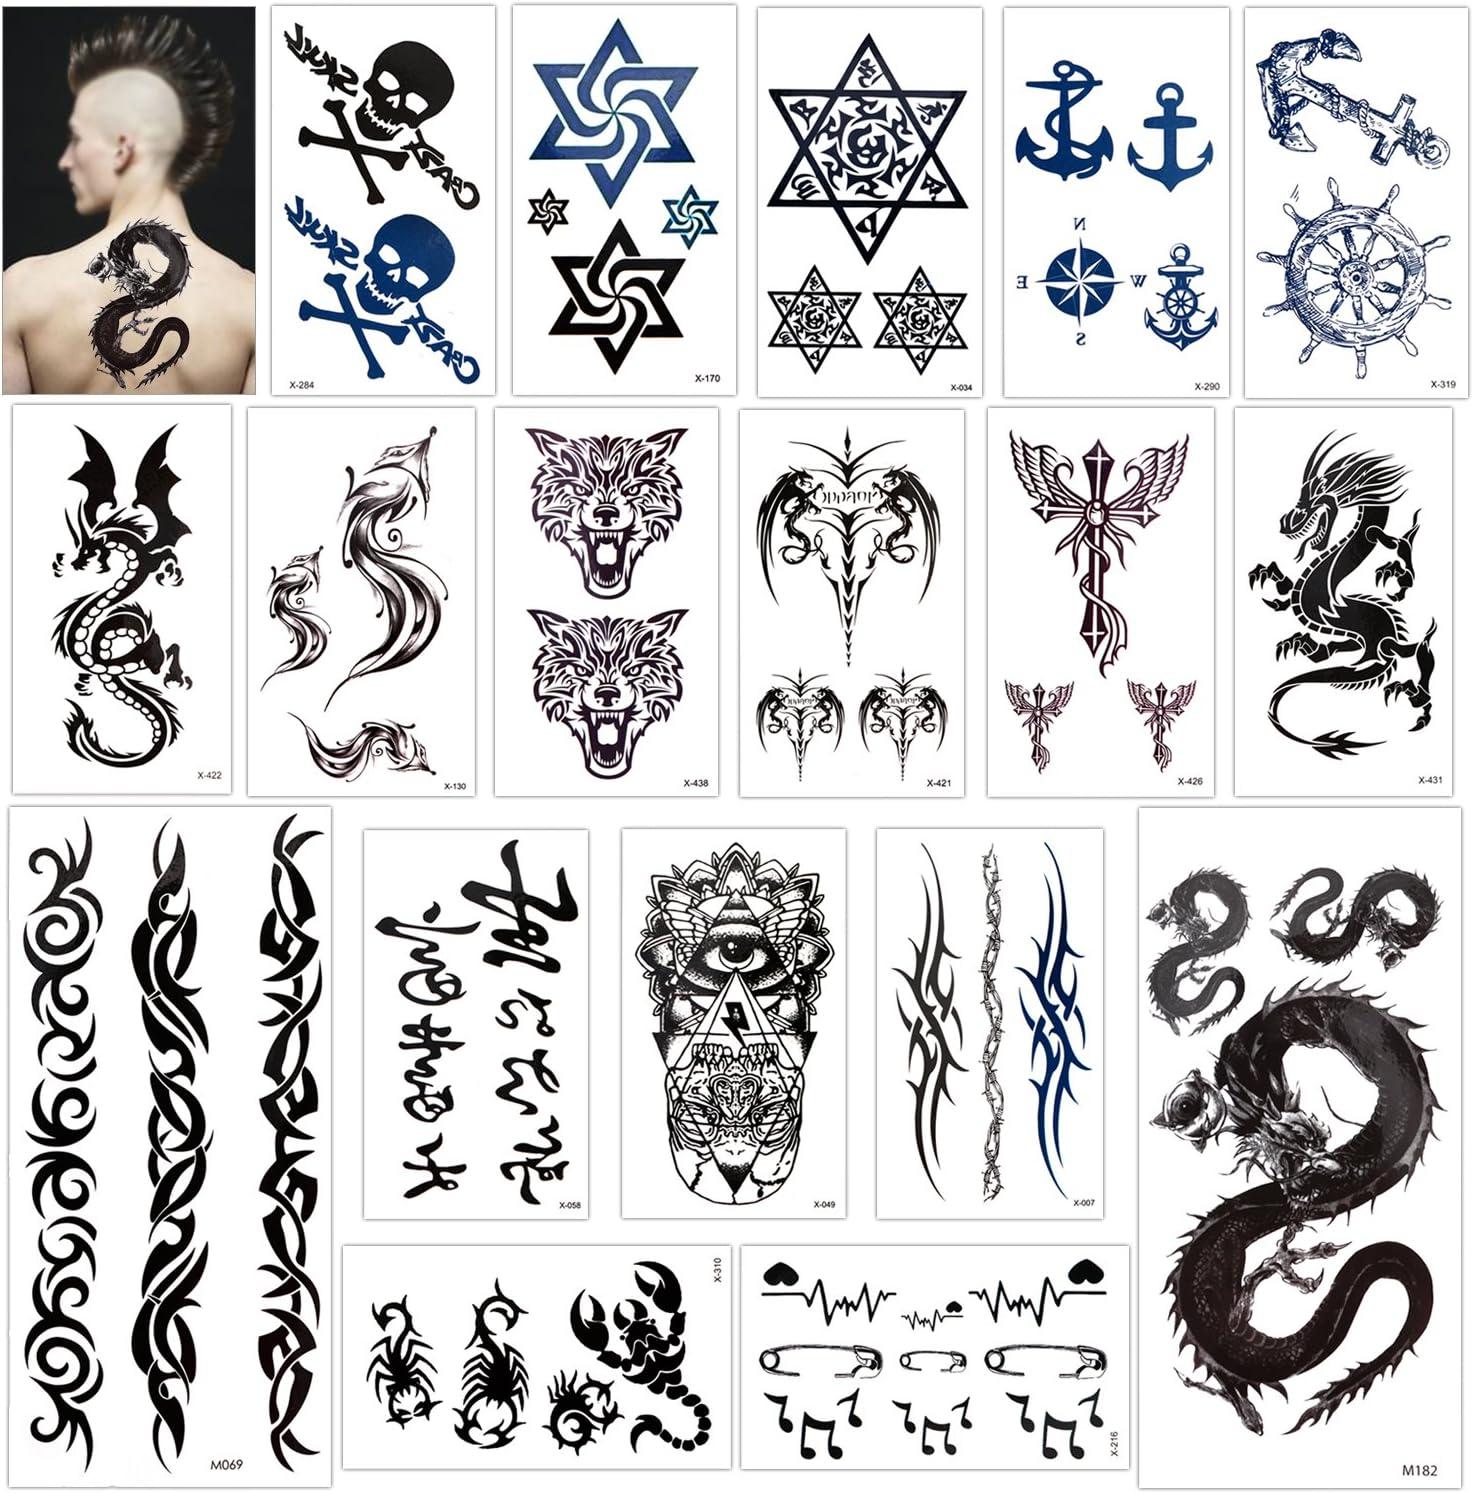 Konsait Temporary Tattoo for Adults Kids Women Men (18 Sheets), Temporary Tattoo Stickers Paper Kit Fake Tattoo Body Sticker Cover Up Set,Dragon Eye Heartbeat Tiger Vine Scorpion Graphic Skull